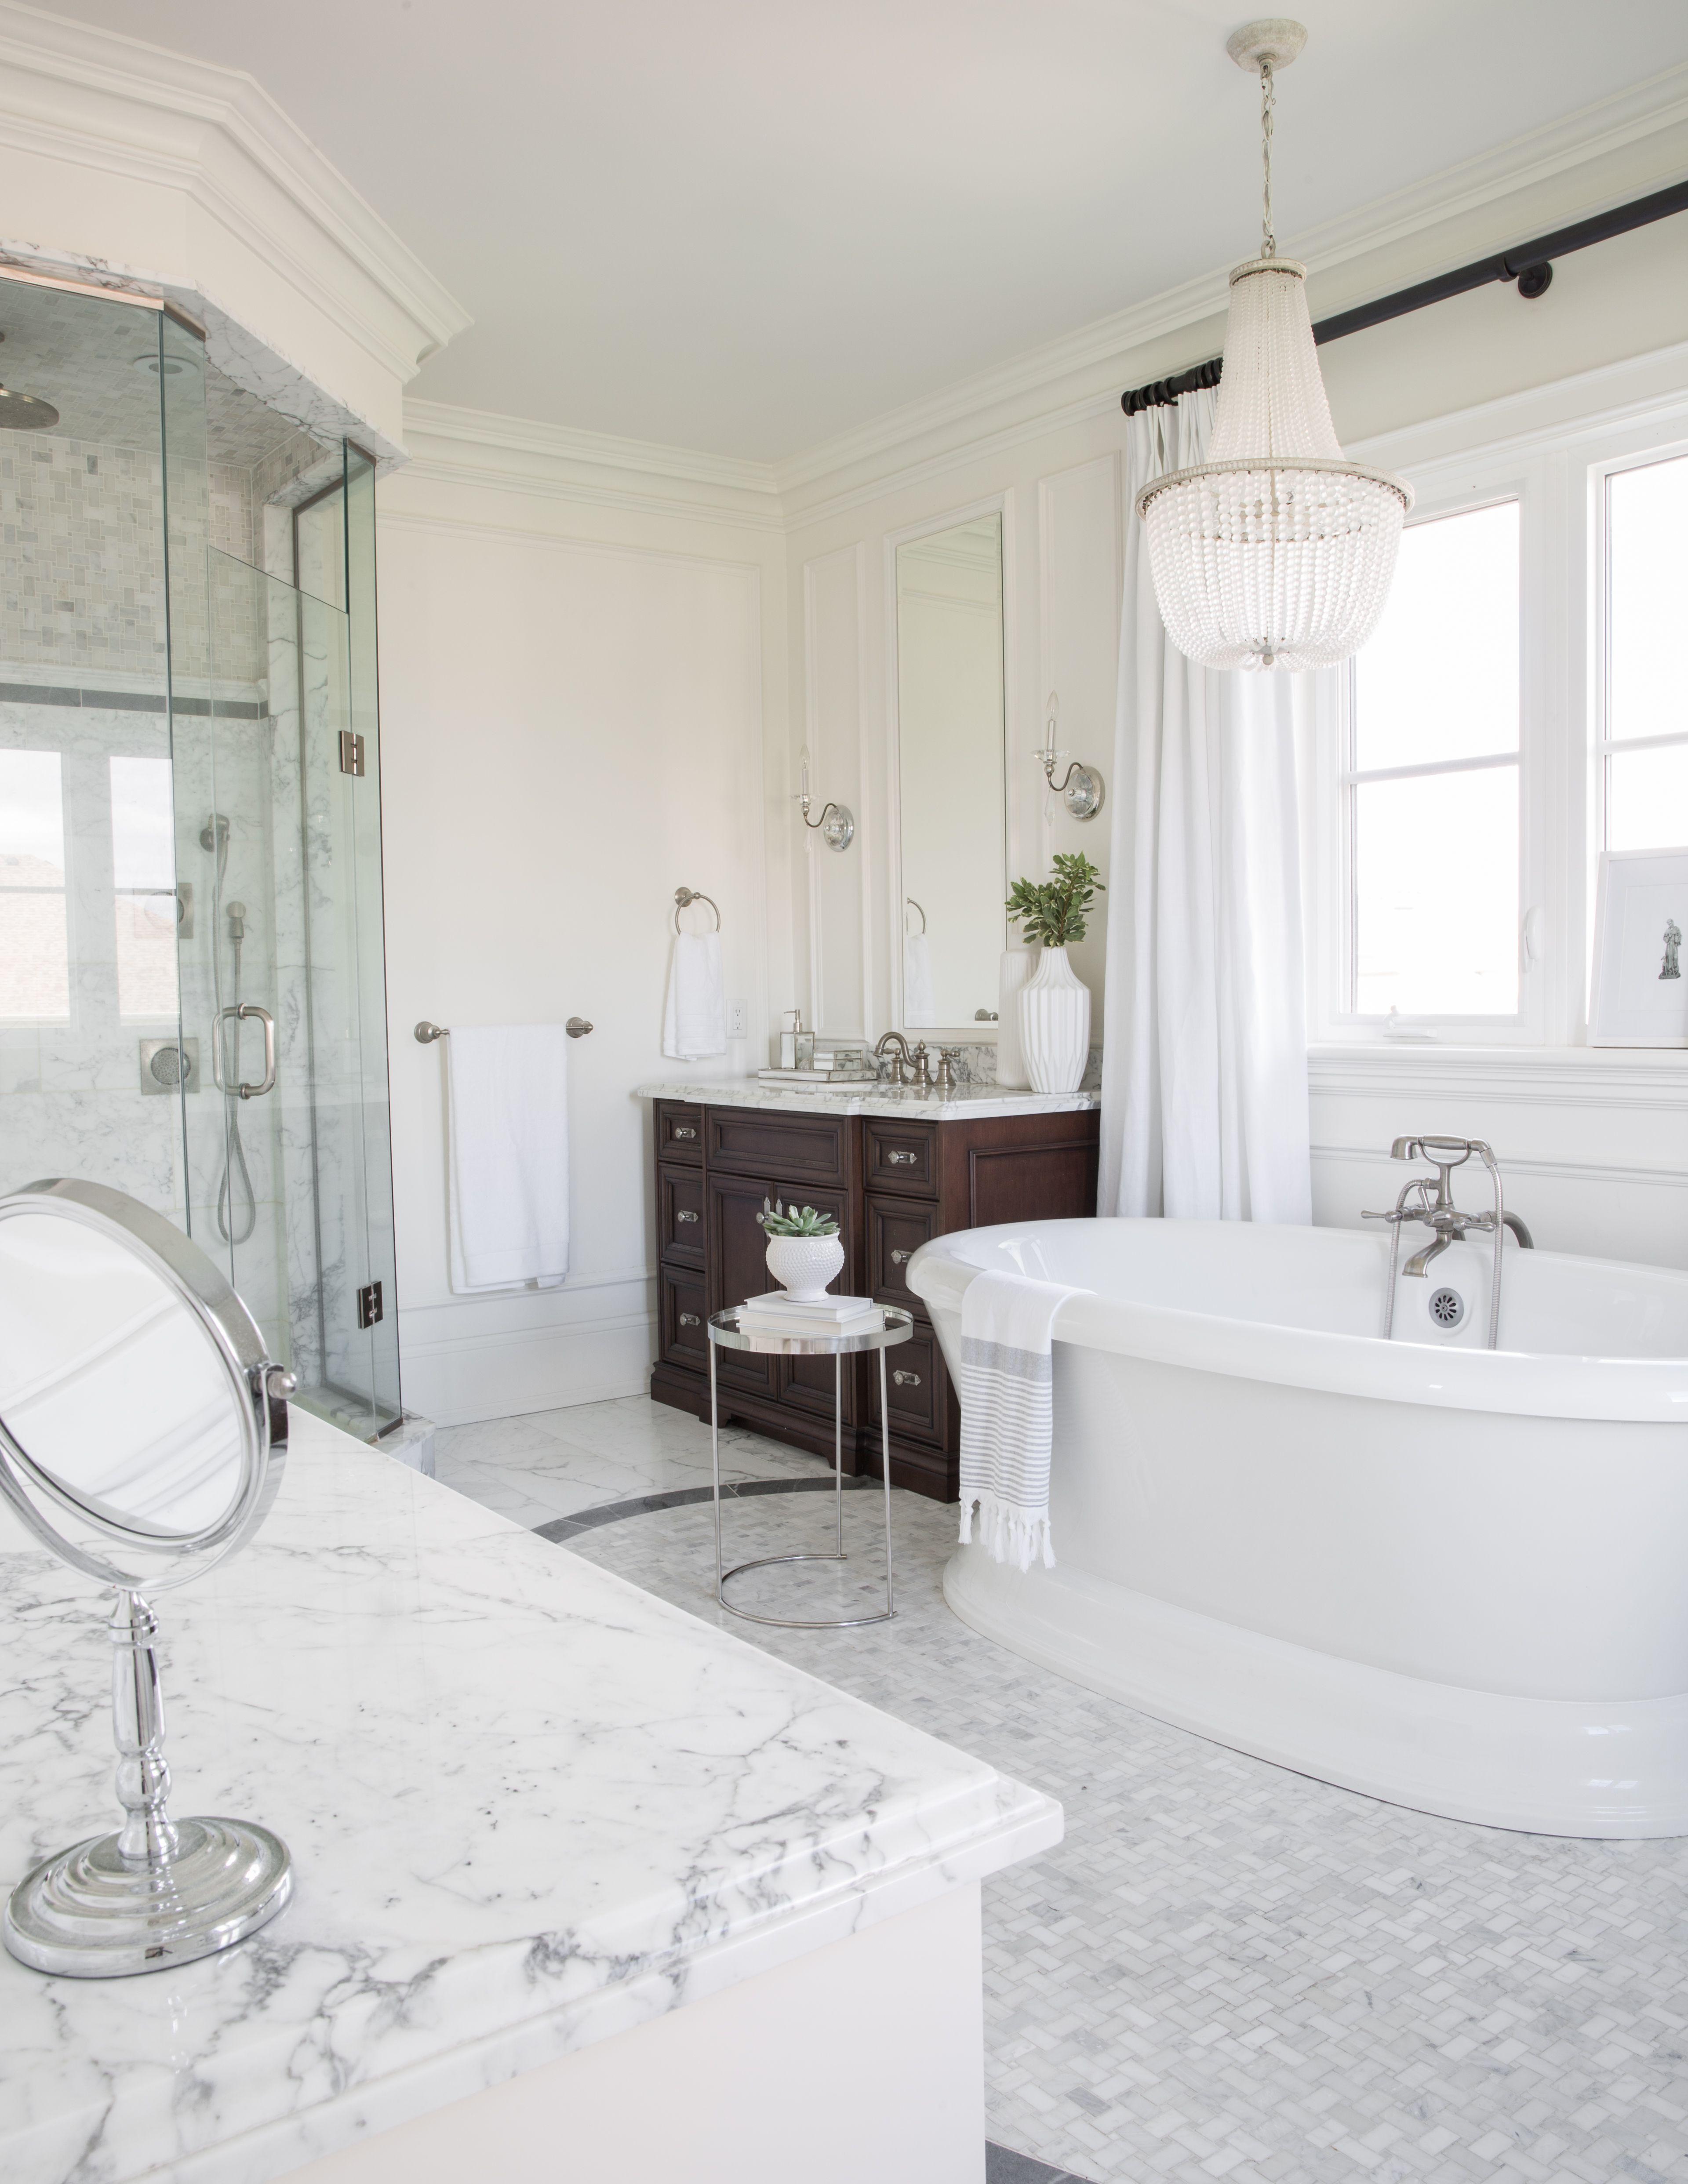 Beautiful White Bathroom Design White Spaces Master Bathroom Design Bathroom Chand White Bathroom Designs Trendy Bathroom Designs Master Bedroom Bathroom